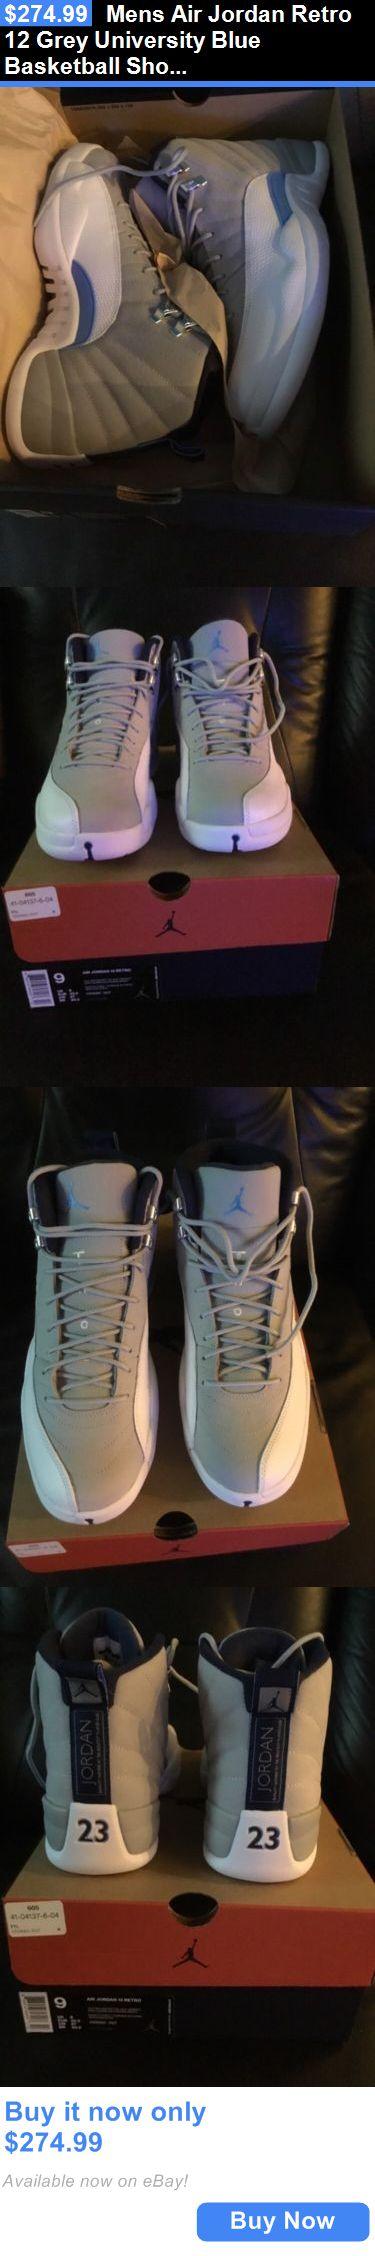 Basketball: Mens Air Jordan Retro 12 Grey University Blue Basketball Shoes Size 9 BUY IT NOW ONLY: $274.99